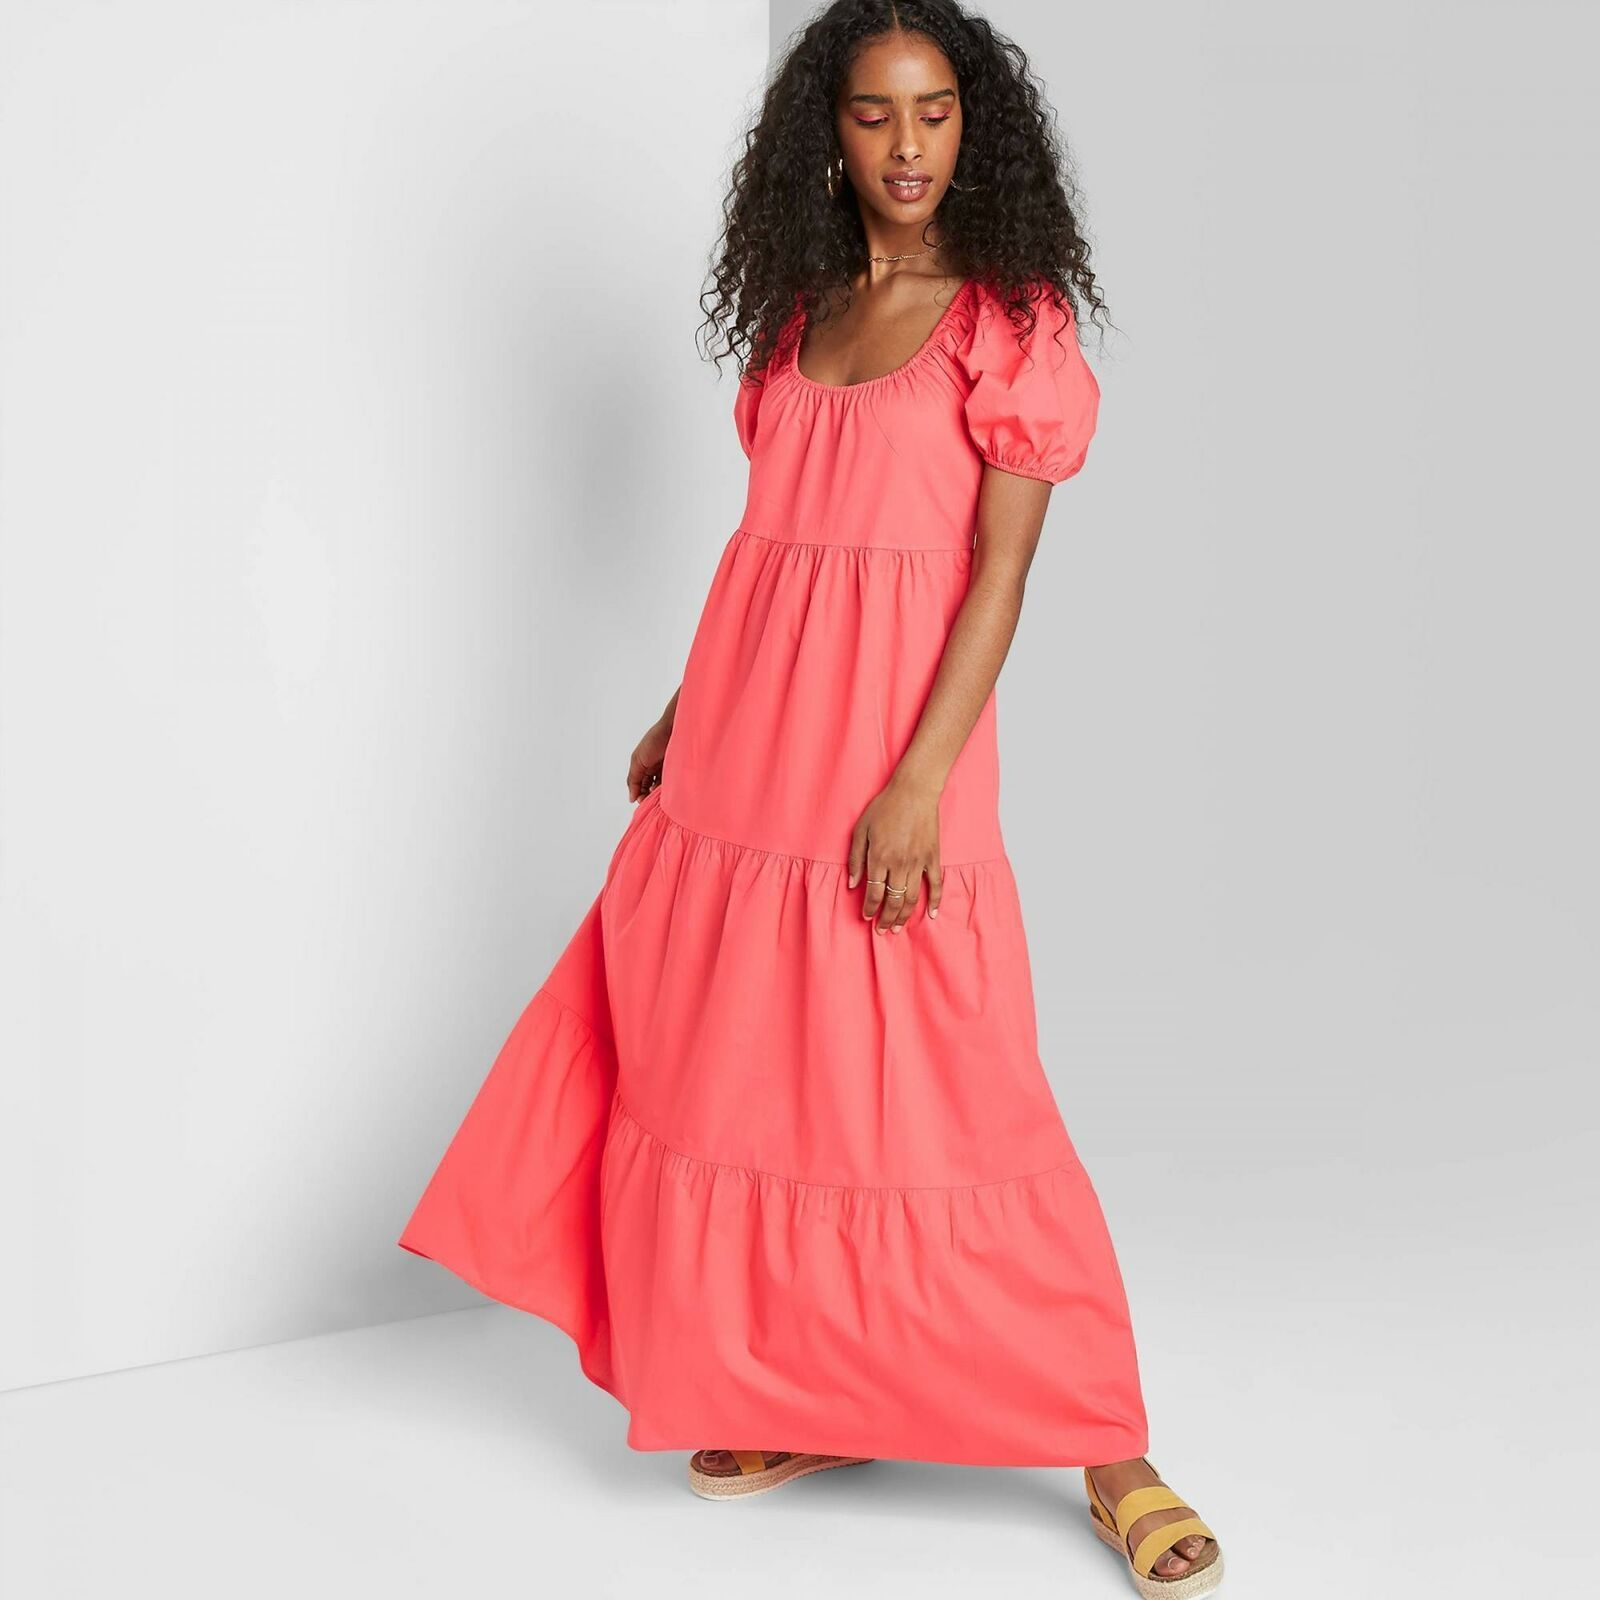 Wild Fable Women S Short Sleeve Tiered Poplin Maxi Dress In 2021 Tiered Dress Pattern Coral Maxi Dresses Maxi Dress [ 1600 x 1600 Pixel ]